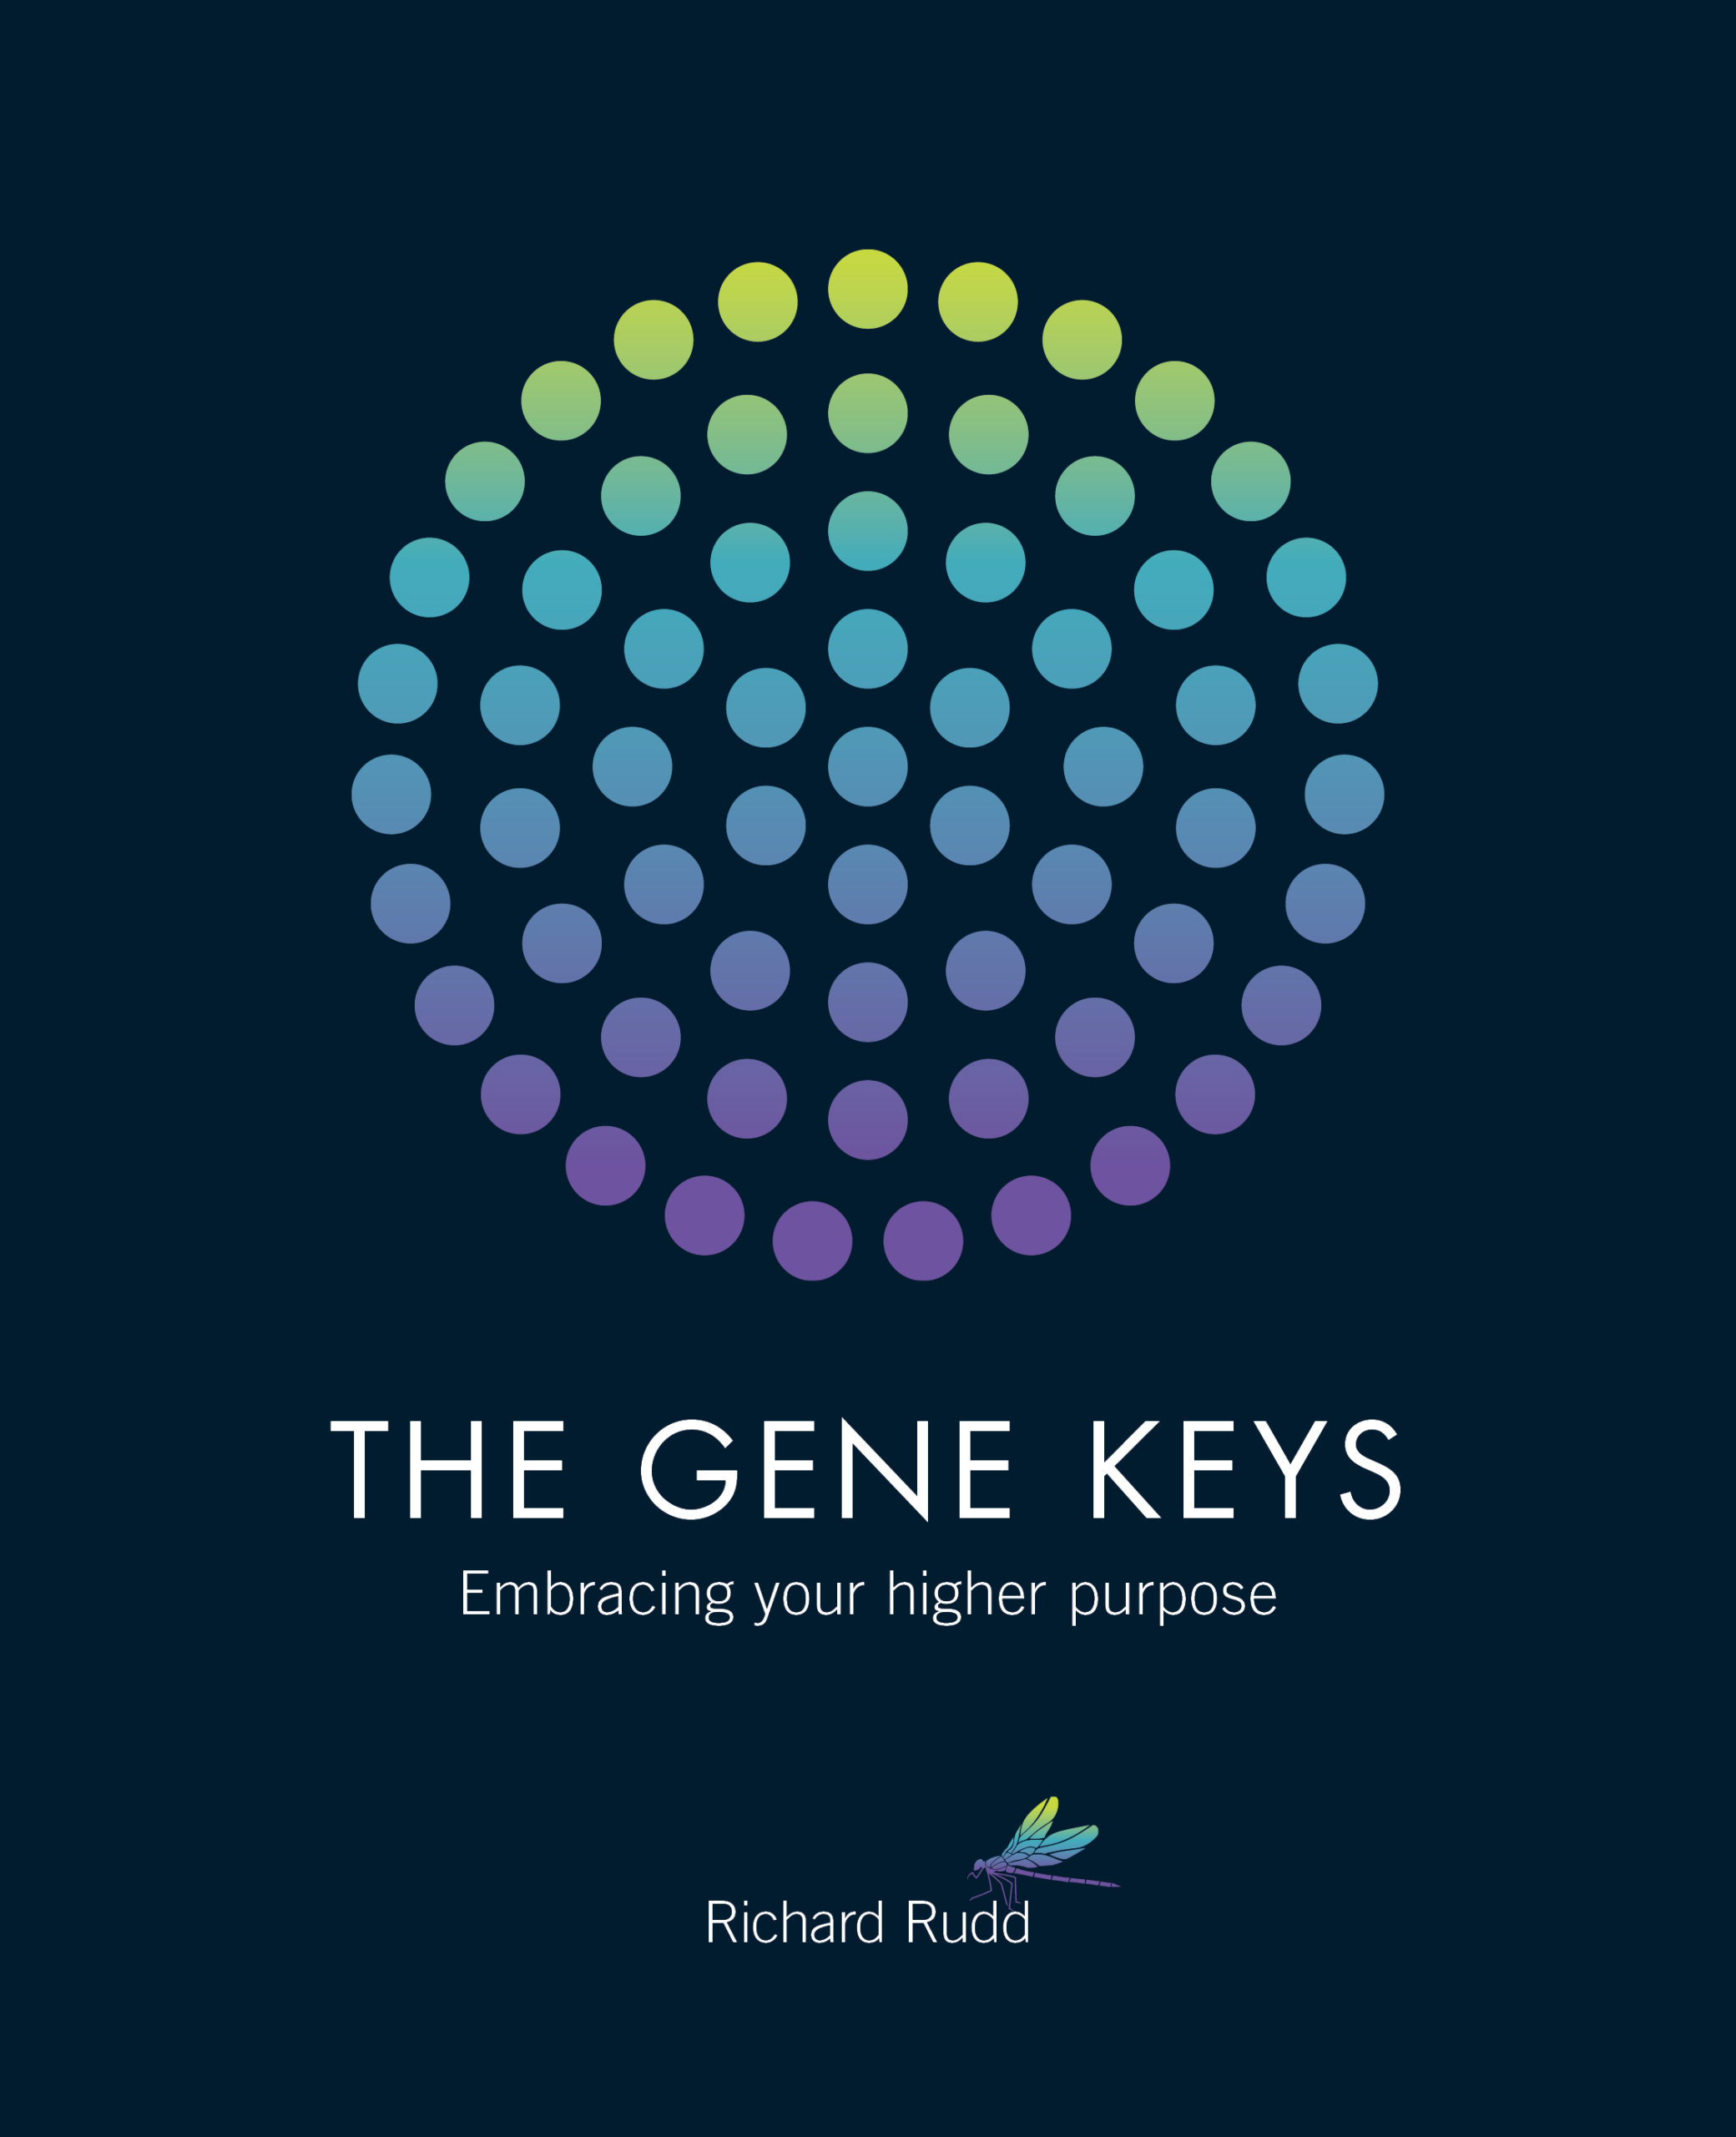 Gene Keys: Unlocking the Higher Purpose Hidden in Your DNA by Richard Rudd